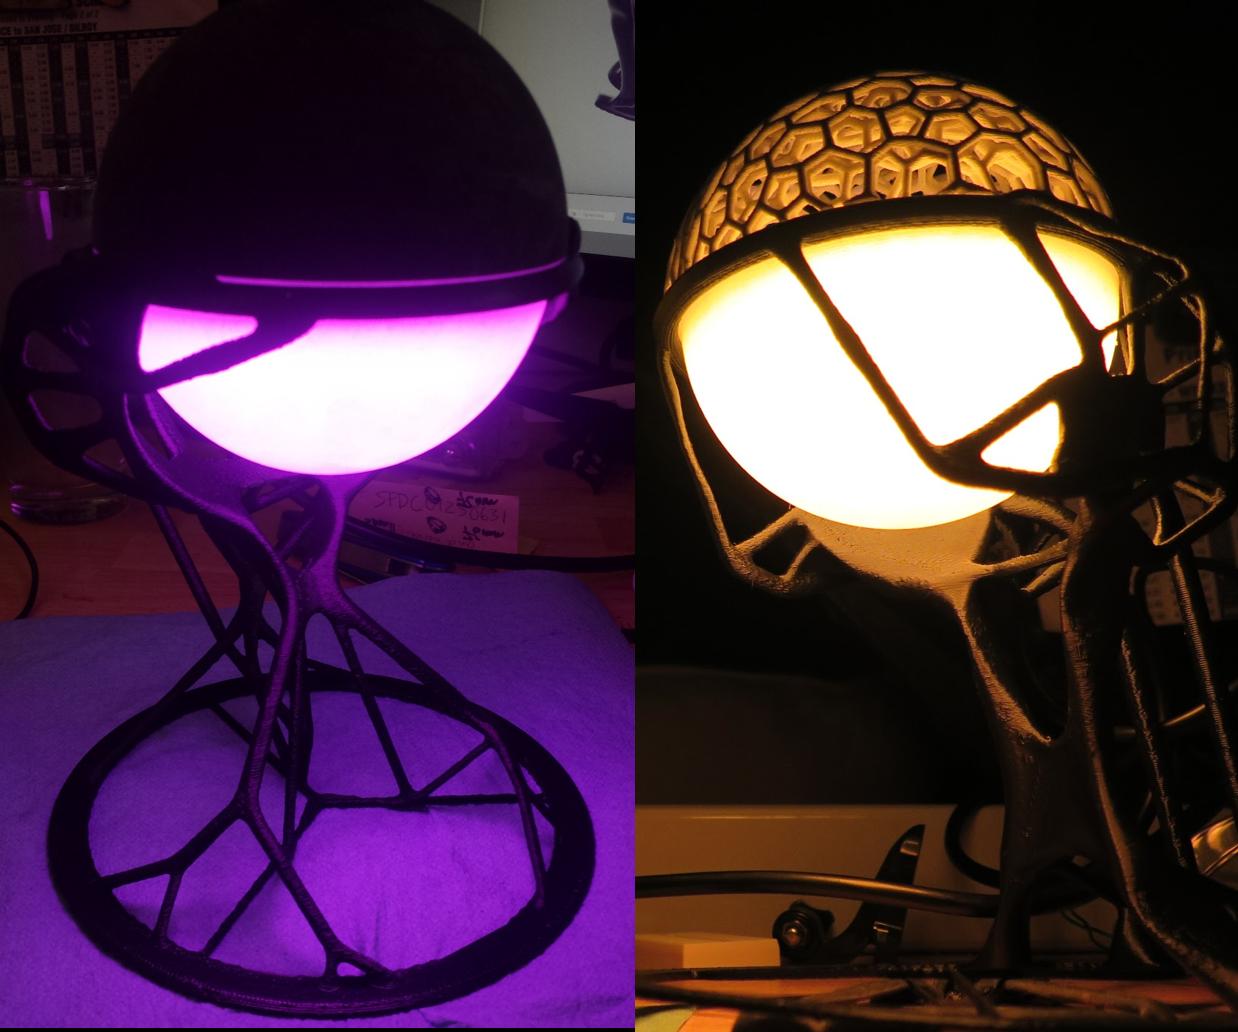 Computational Millennium - Evolution of a Dreamcatcher Lantern